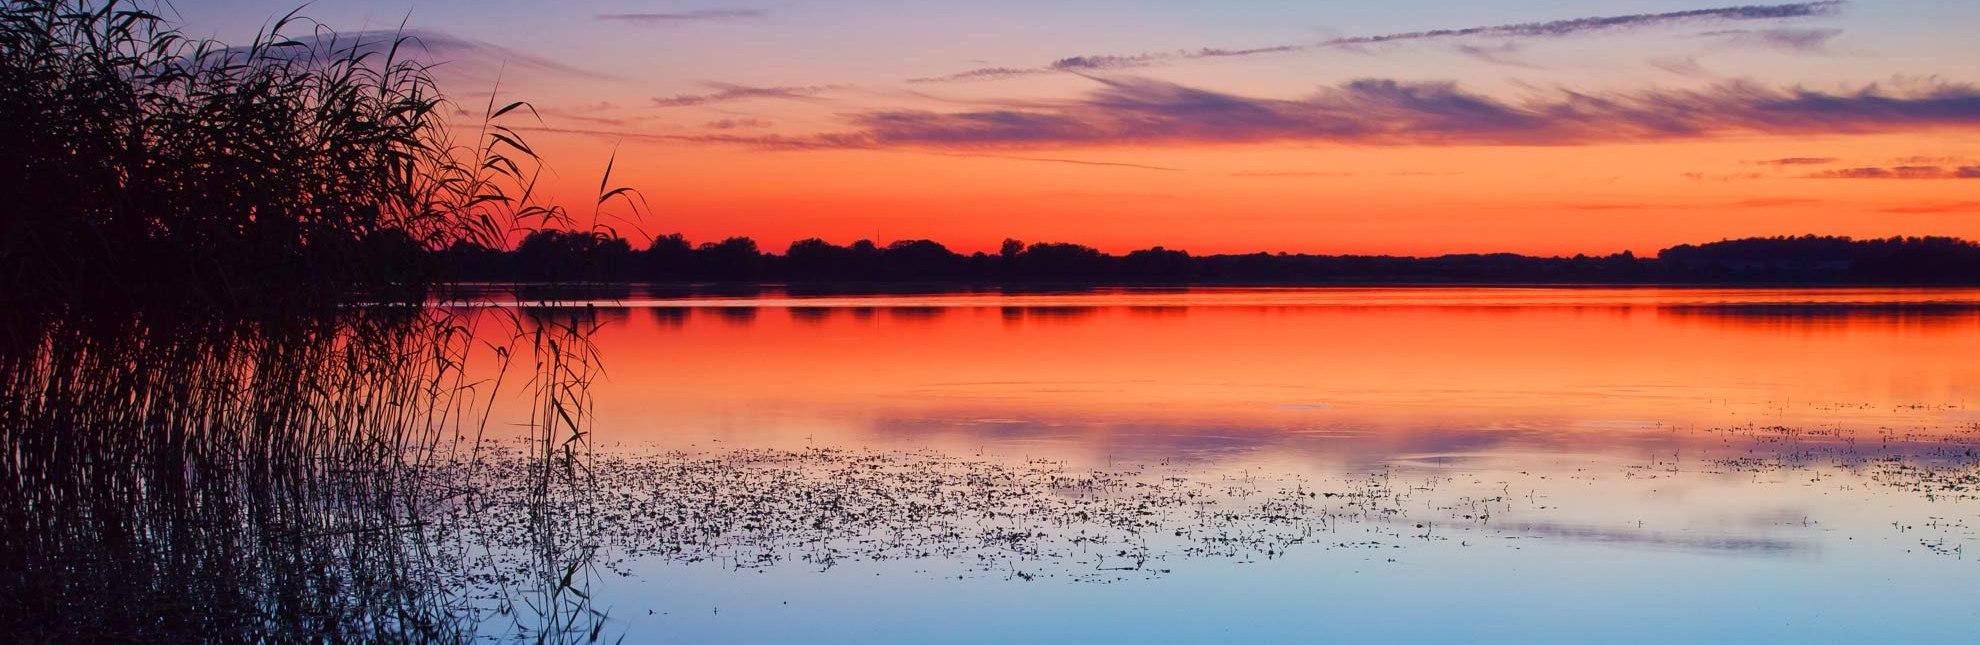 Romantischer Sonnenuntergang am Mechower See., © Thomas Ebelt / HLMS GmbH